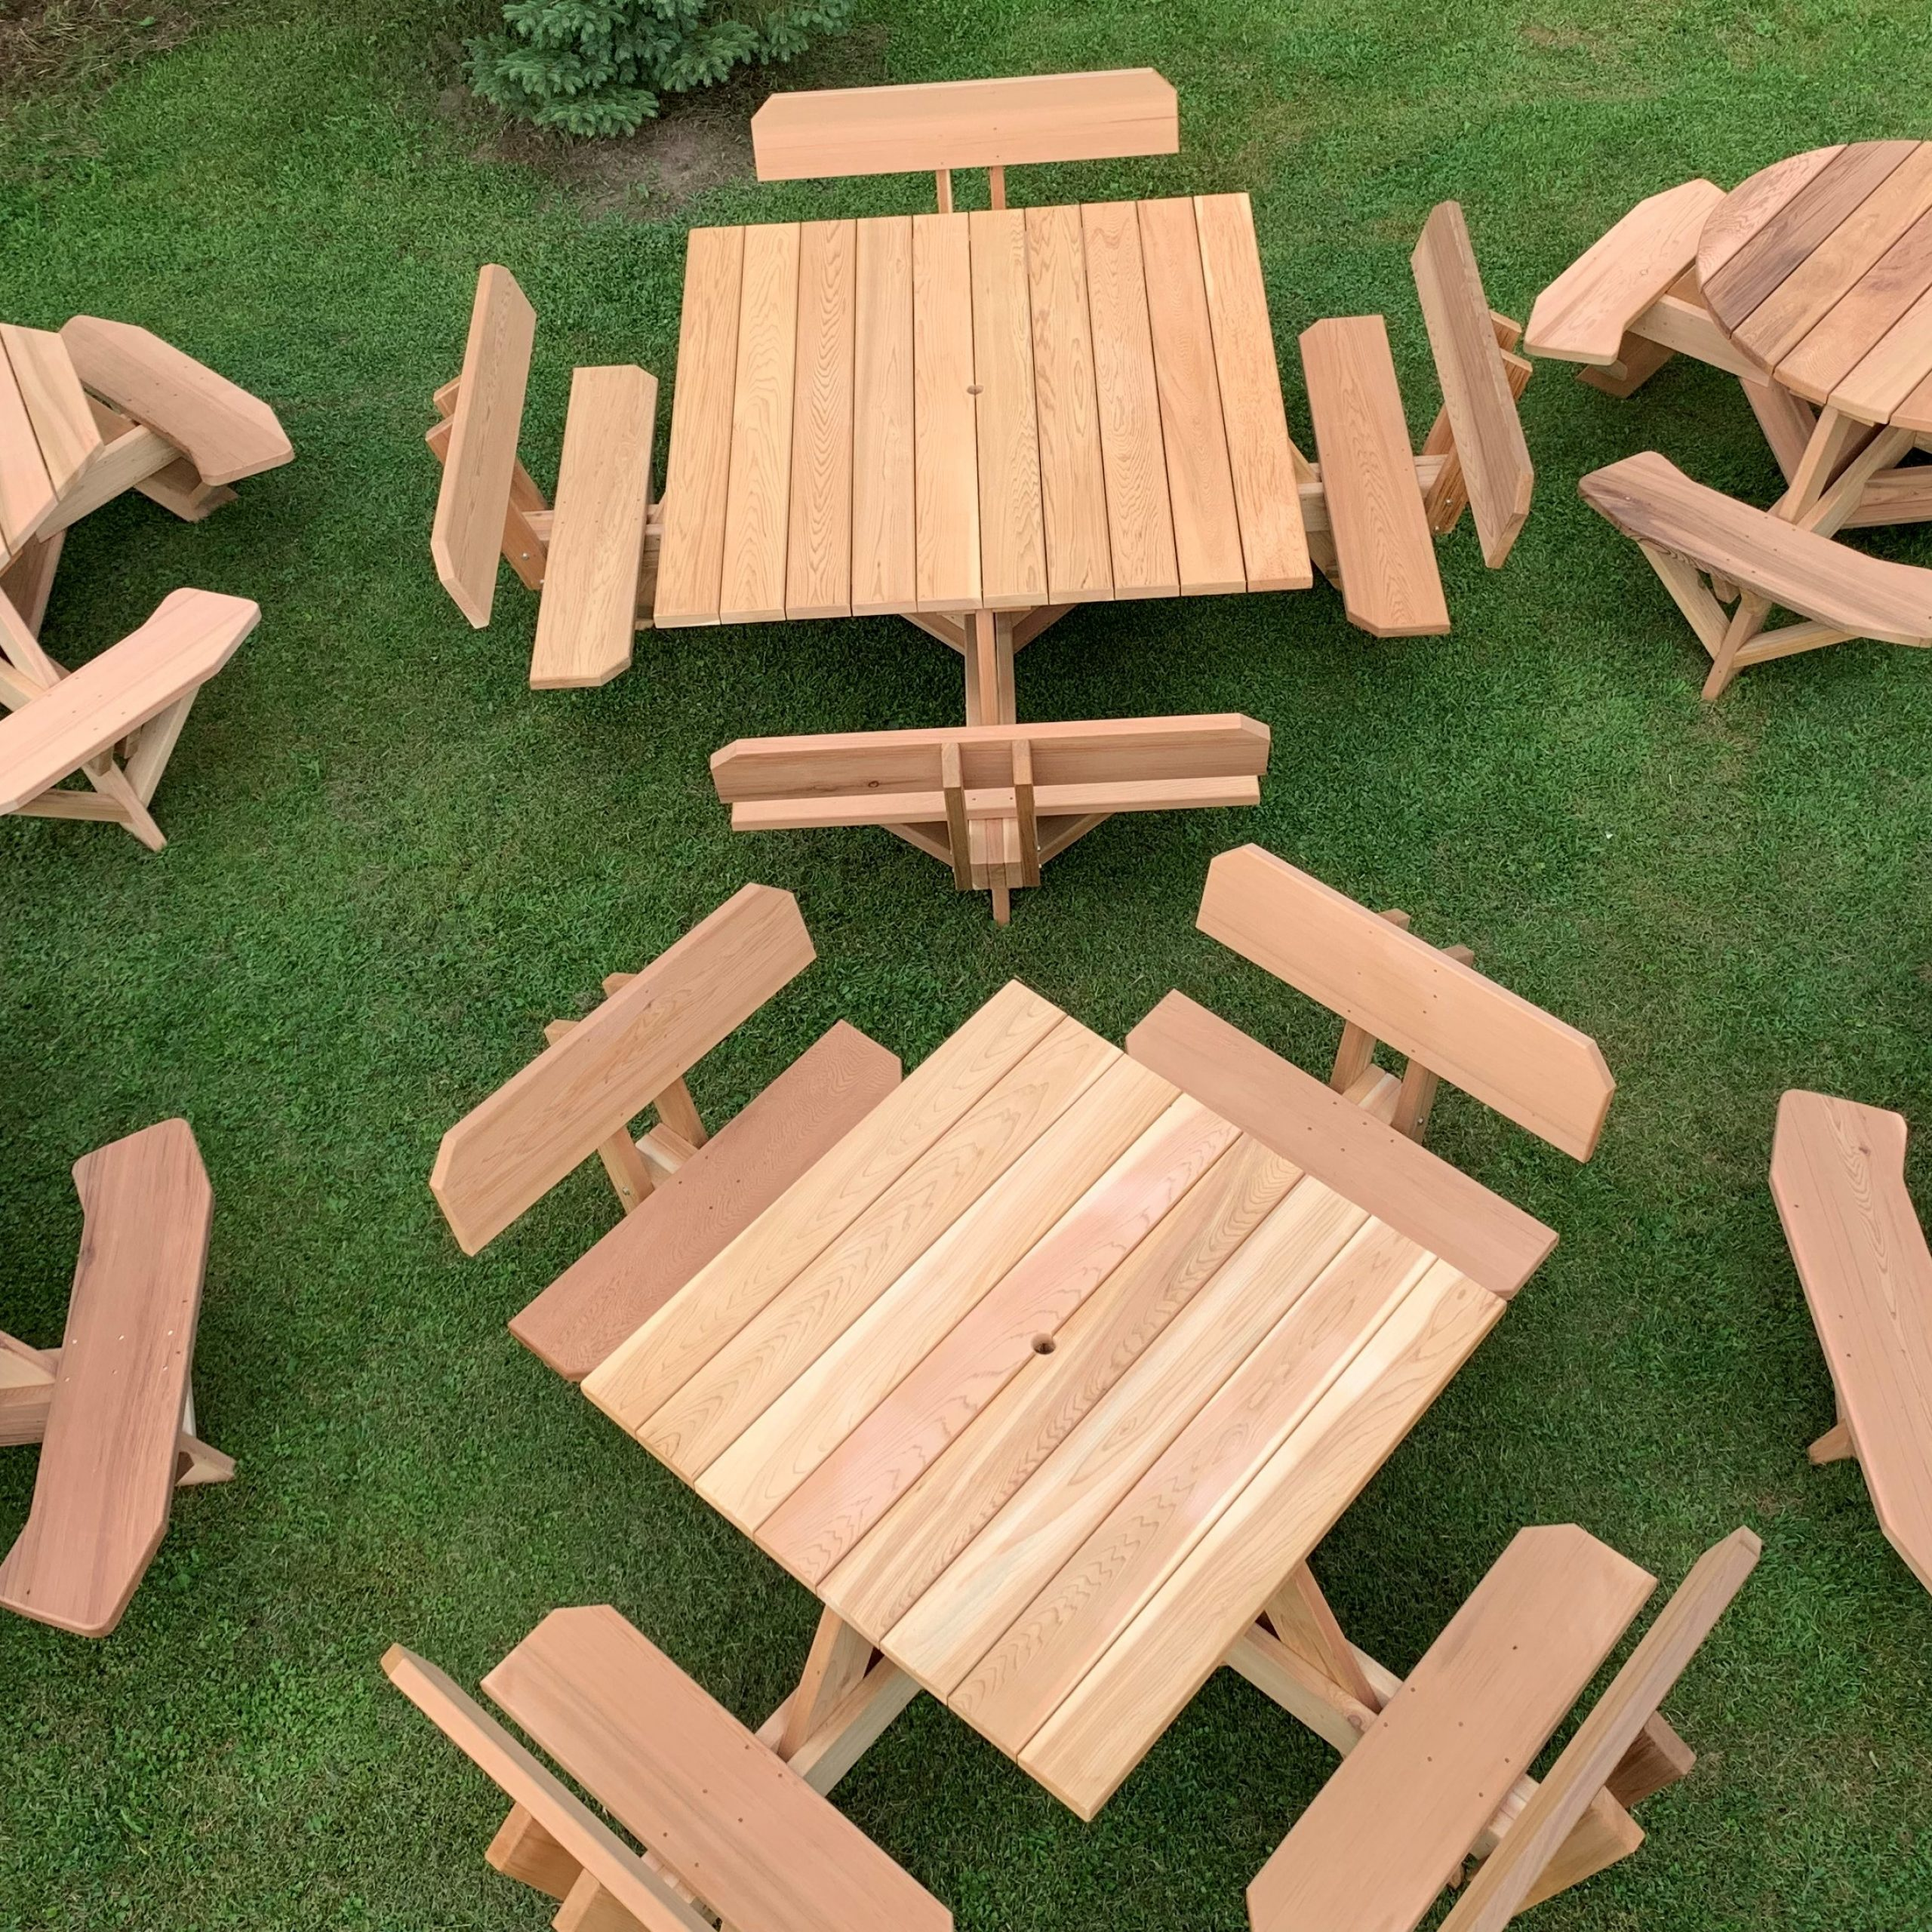 Dan's Outdoor Furniture – Handcrafted Cedar Furniture For Regarding 2 Person Natural Cedar Wood Outdoor Gliders (View 23 of 25)